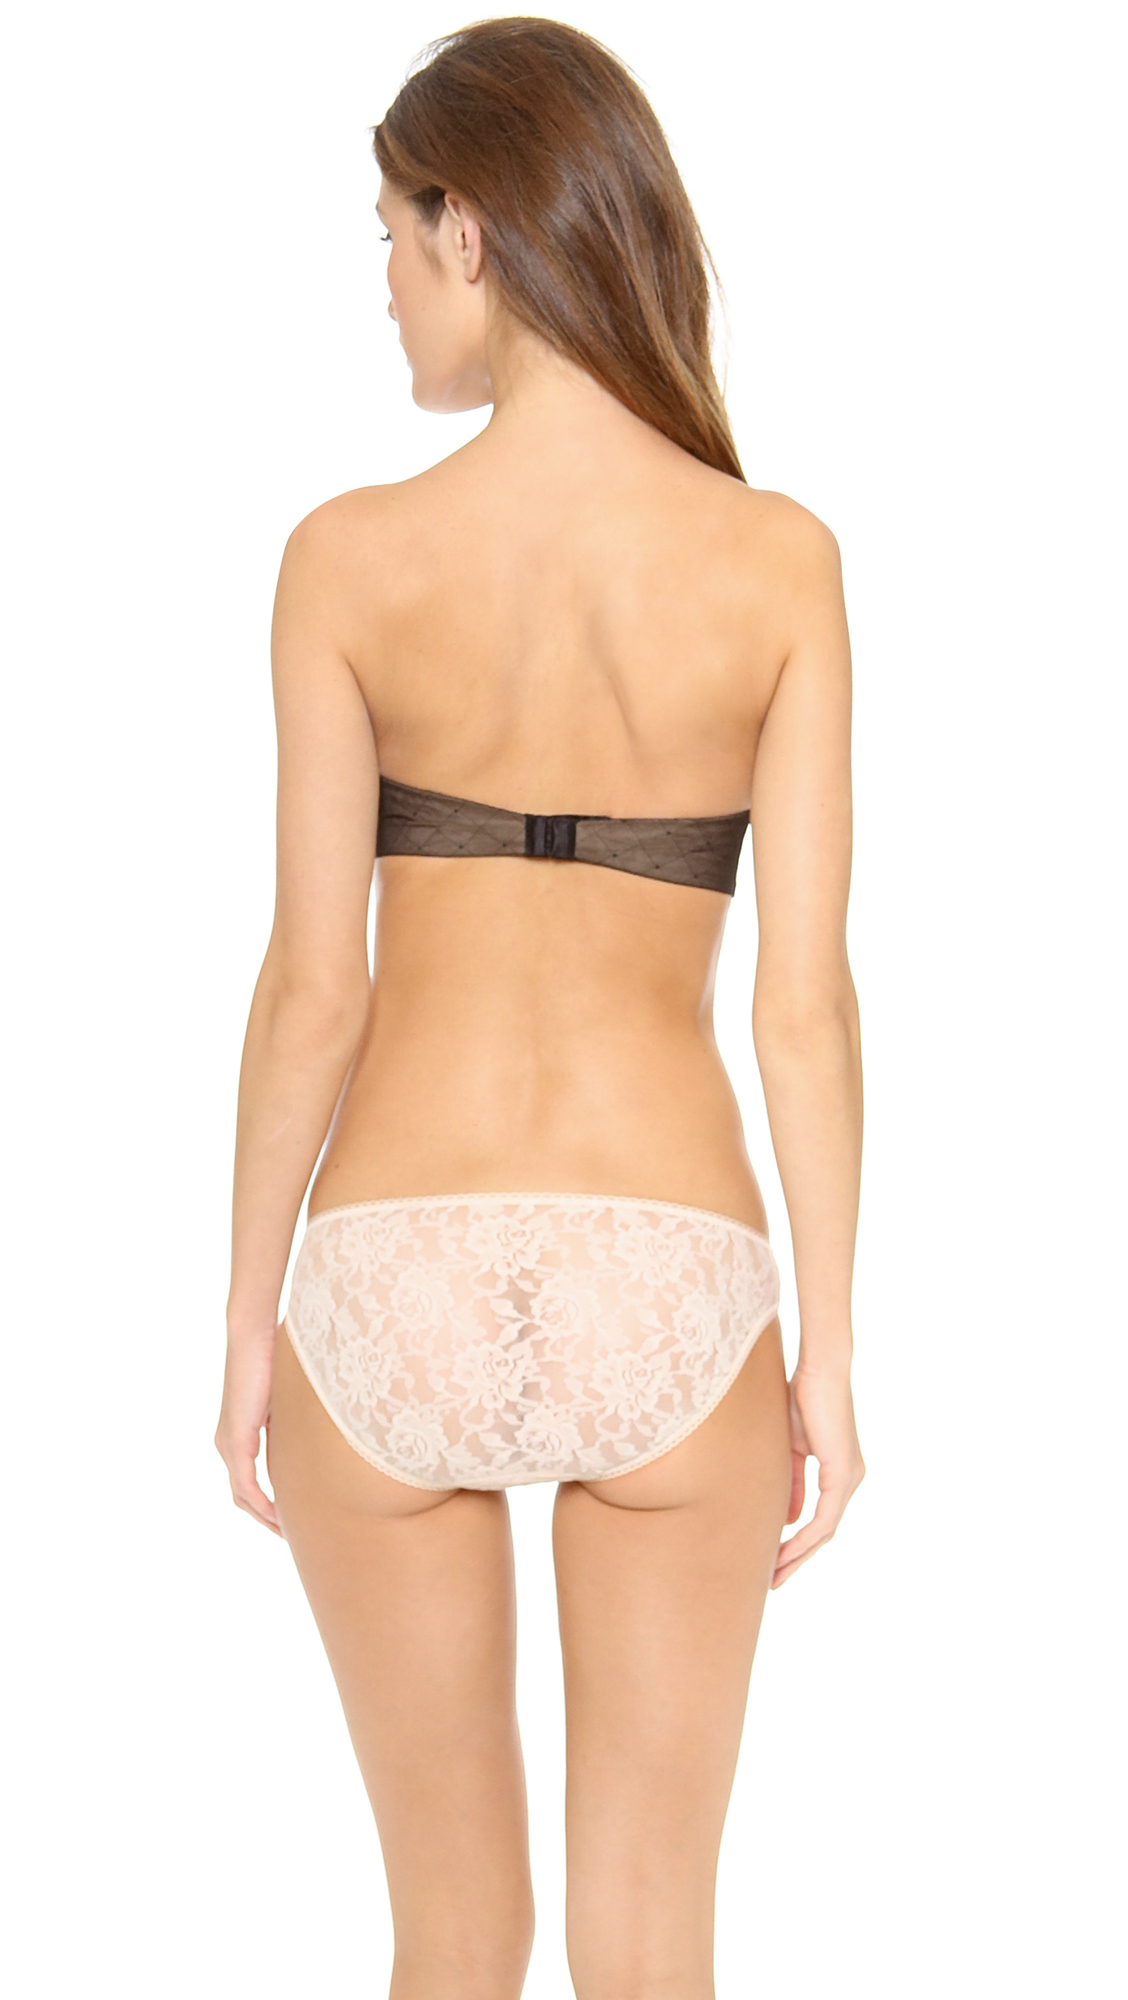 calvin klein seductive comfort illusion lift strapless bra. Black Bedroom Furniture Sets. Home Design Ideas